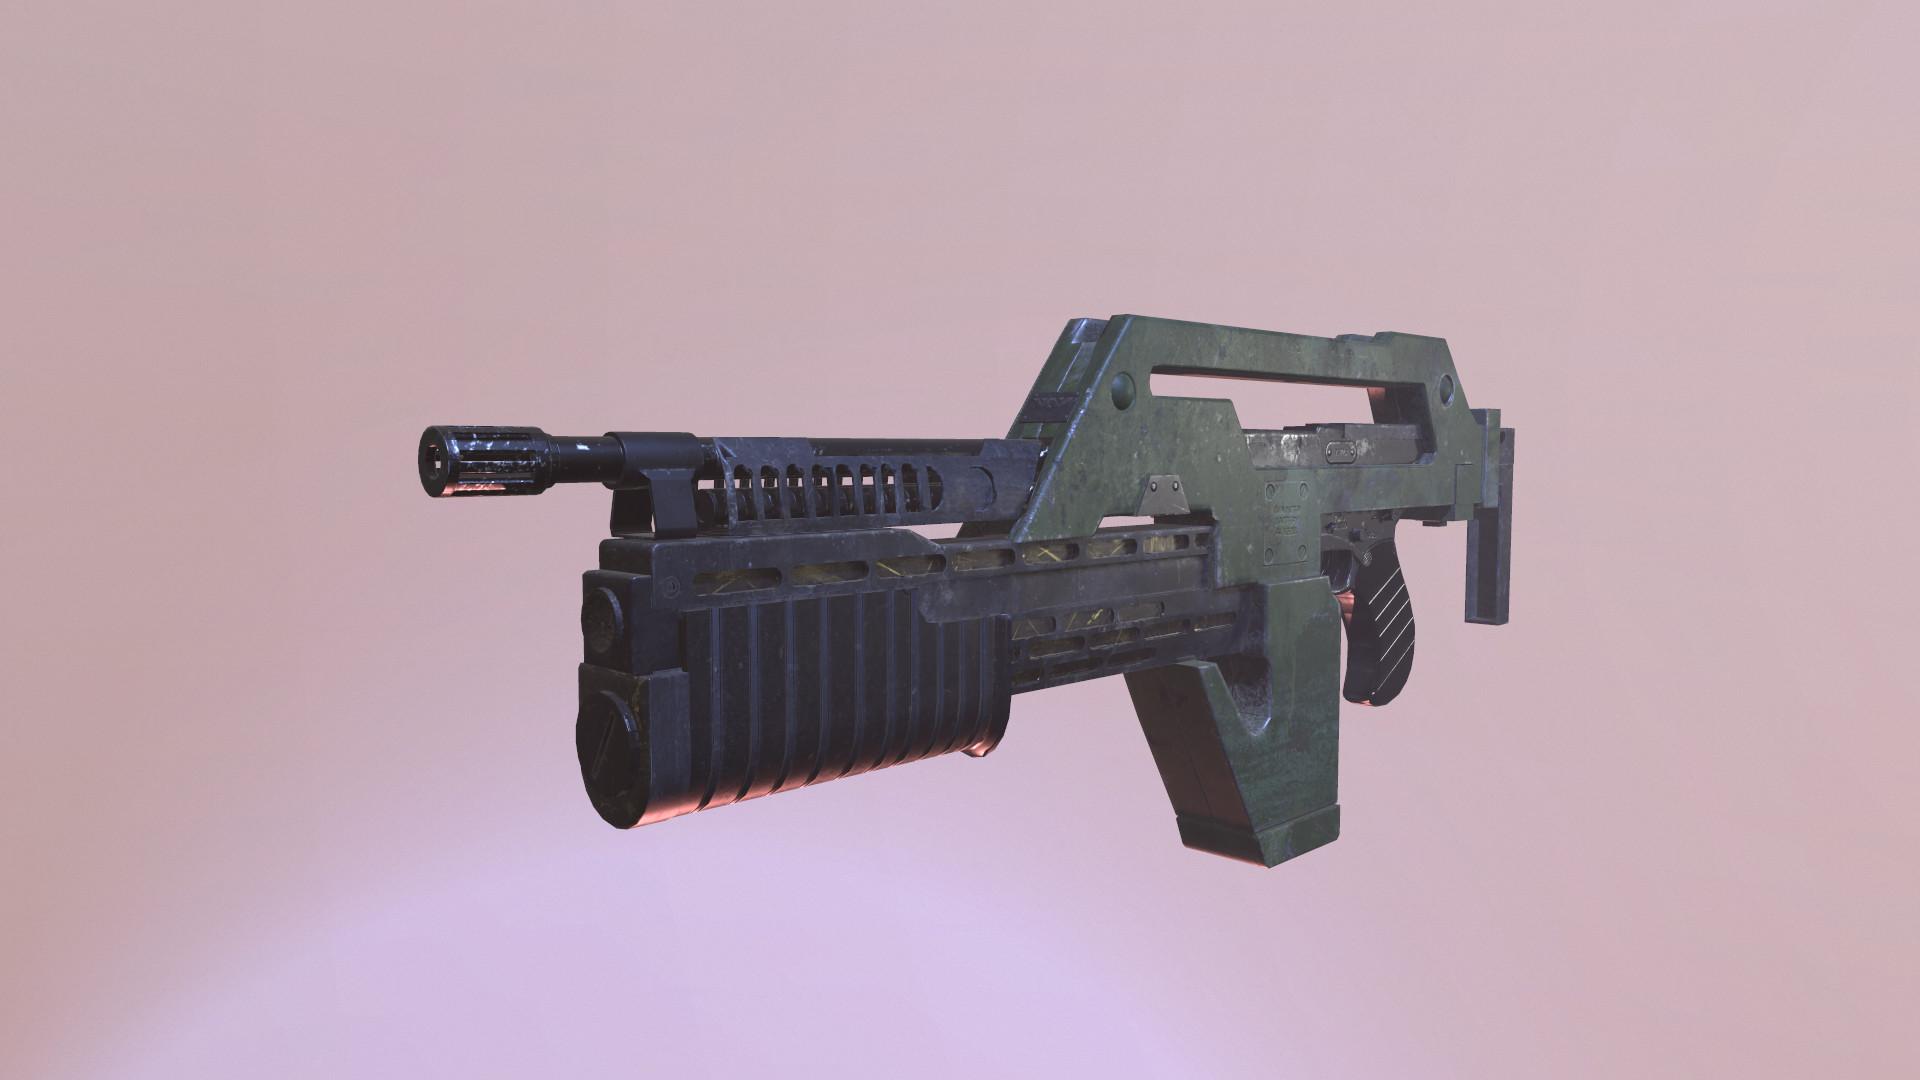 Pulse Rifle from Aliens | Jarrod Hahn